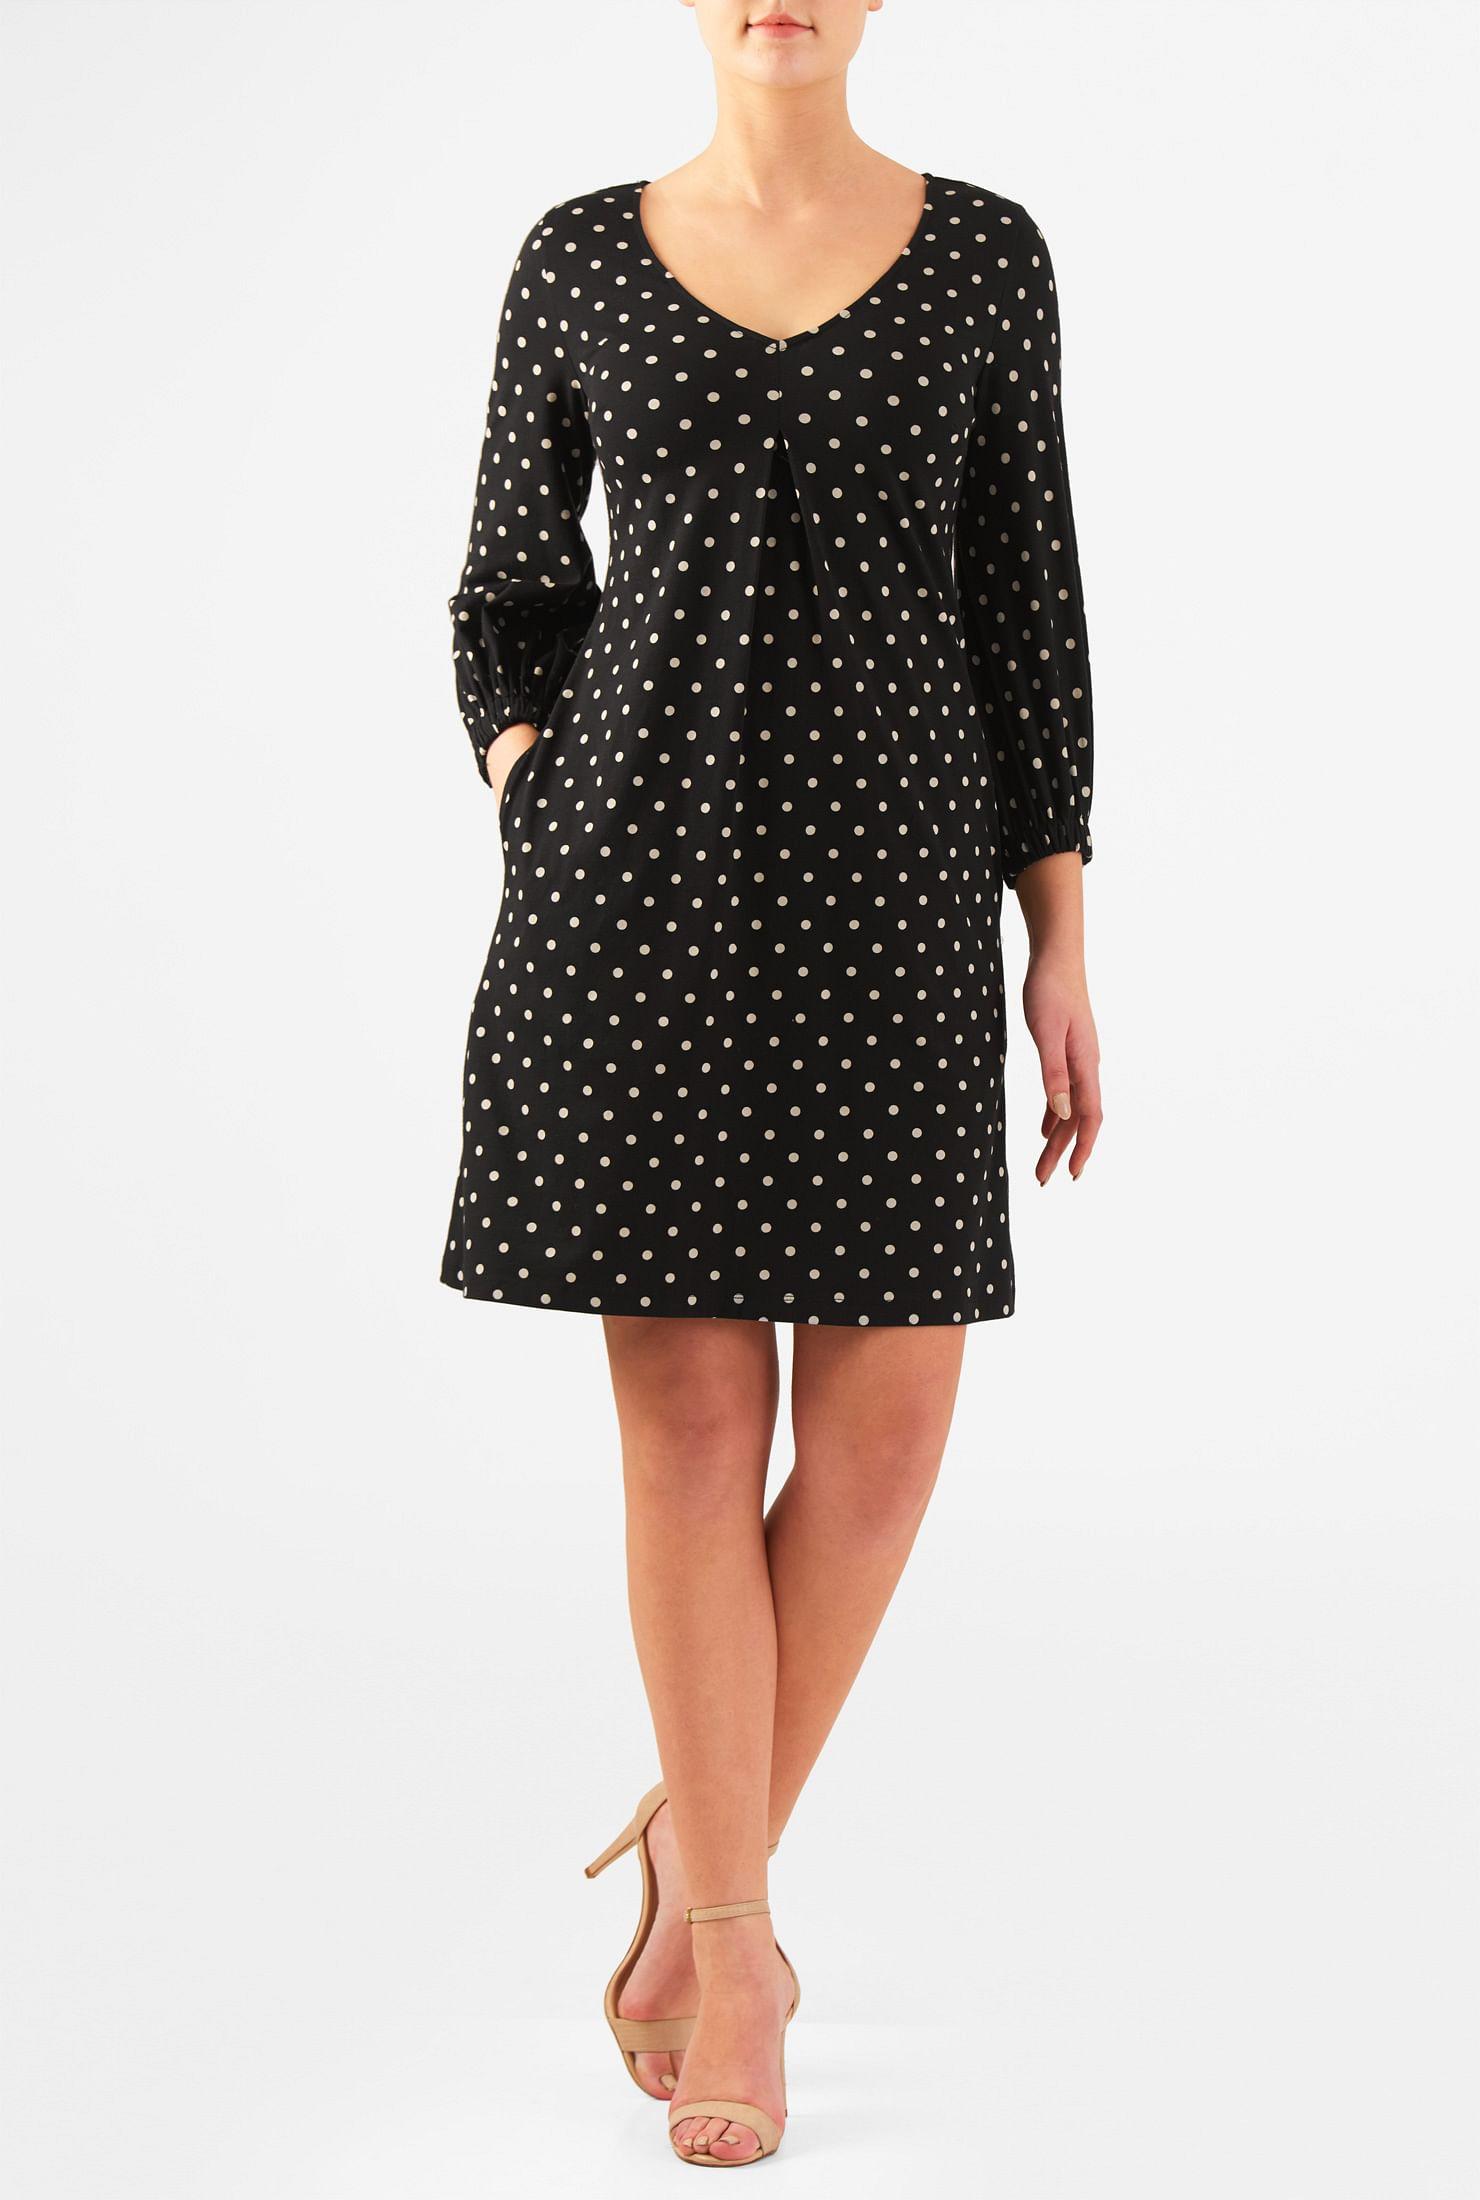 Womens Fashion Clothing 0-36W and Custom